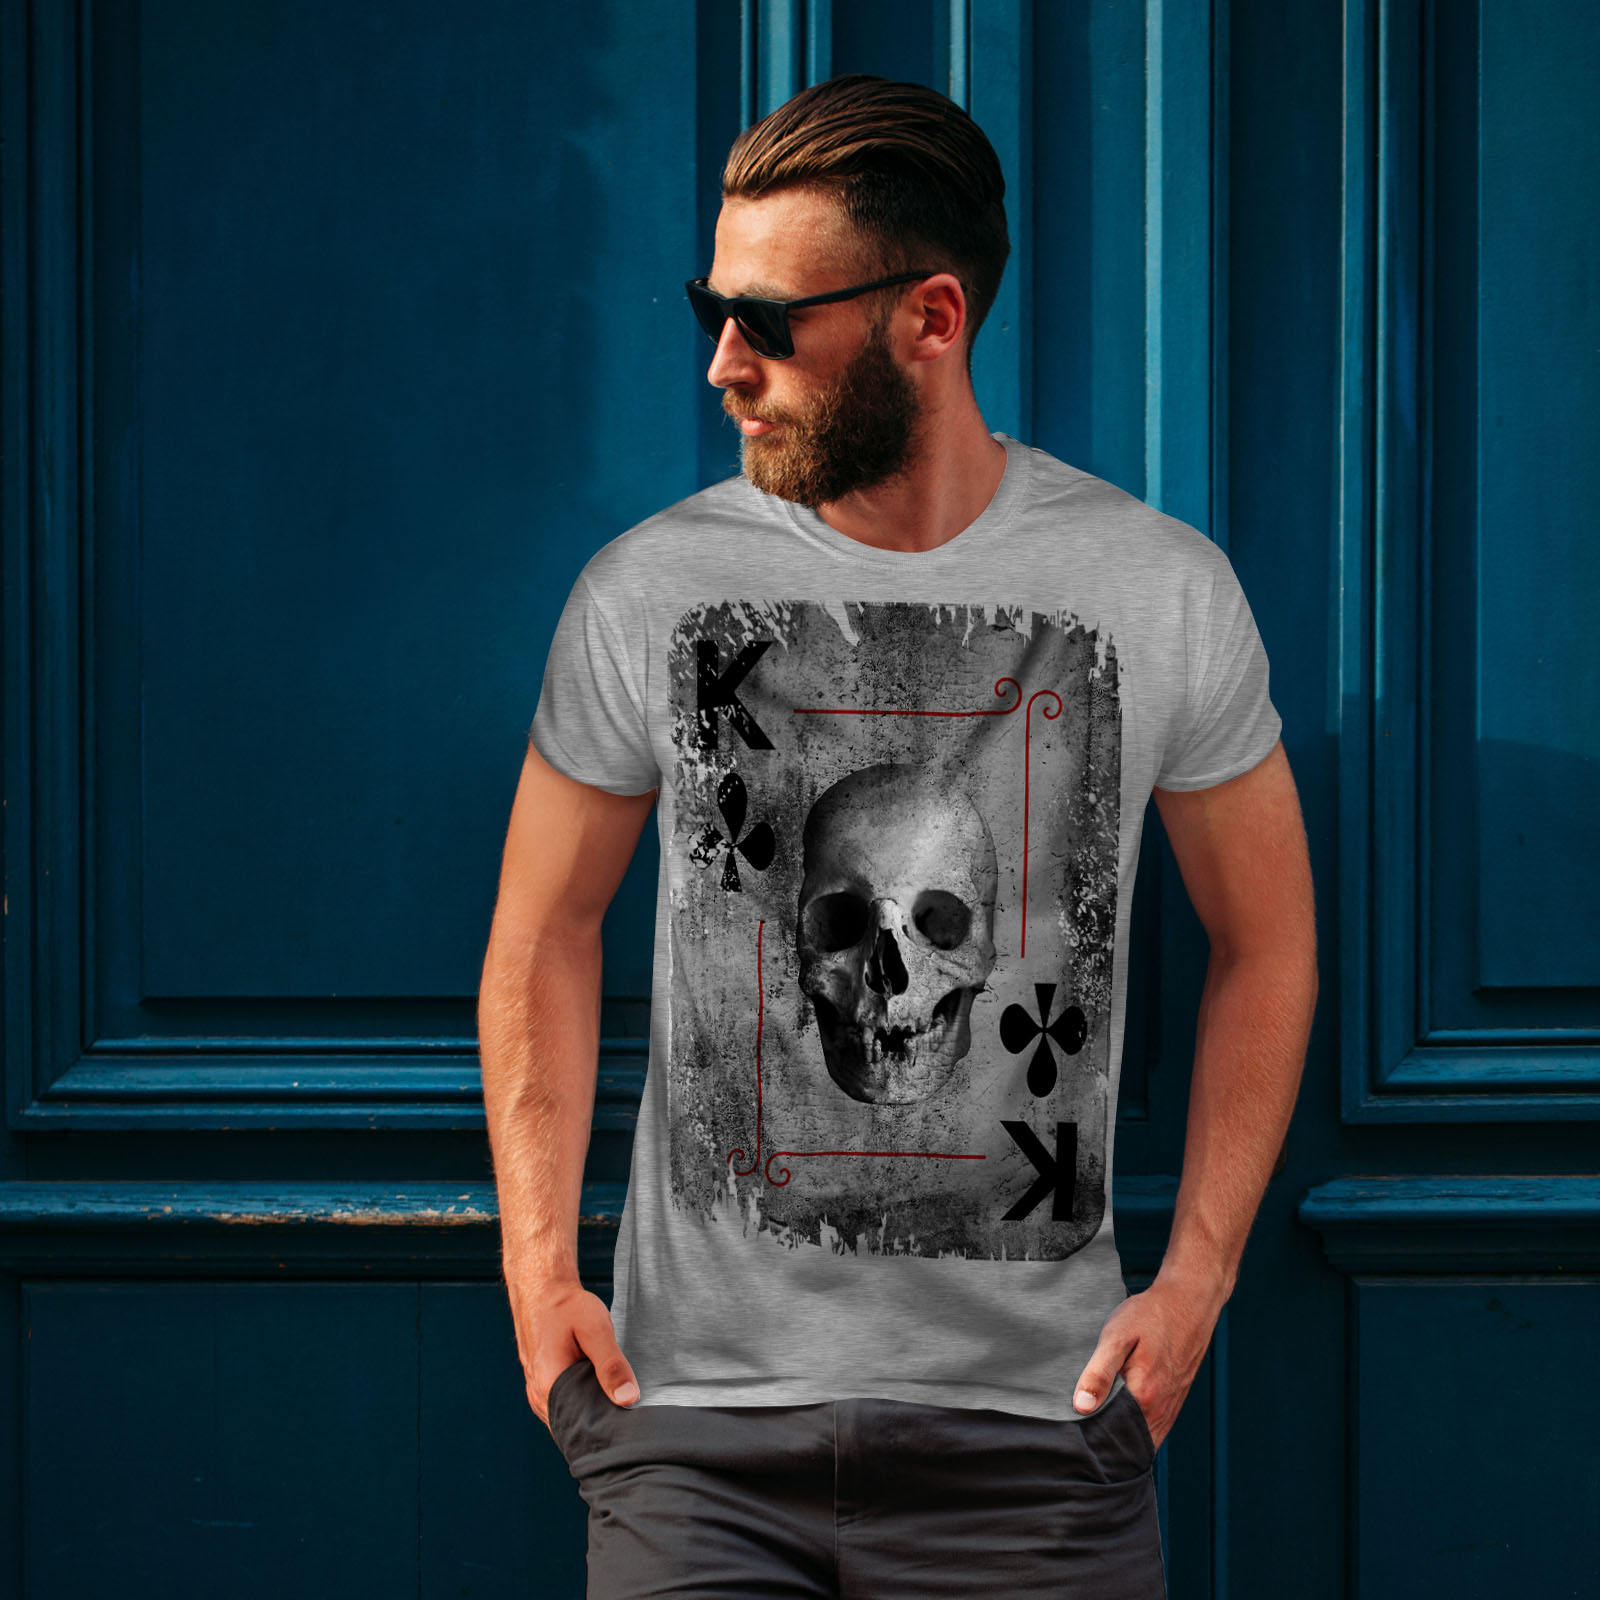 Wellcoda Playing Card Theme Mens T-shirt Angel Graphic Design Printed Tee